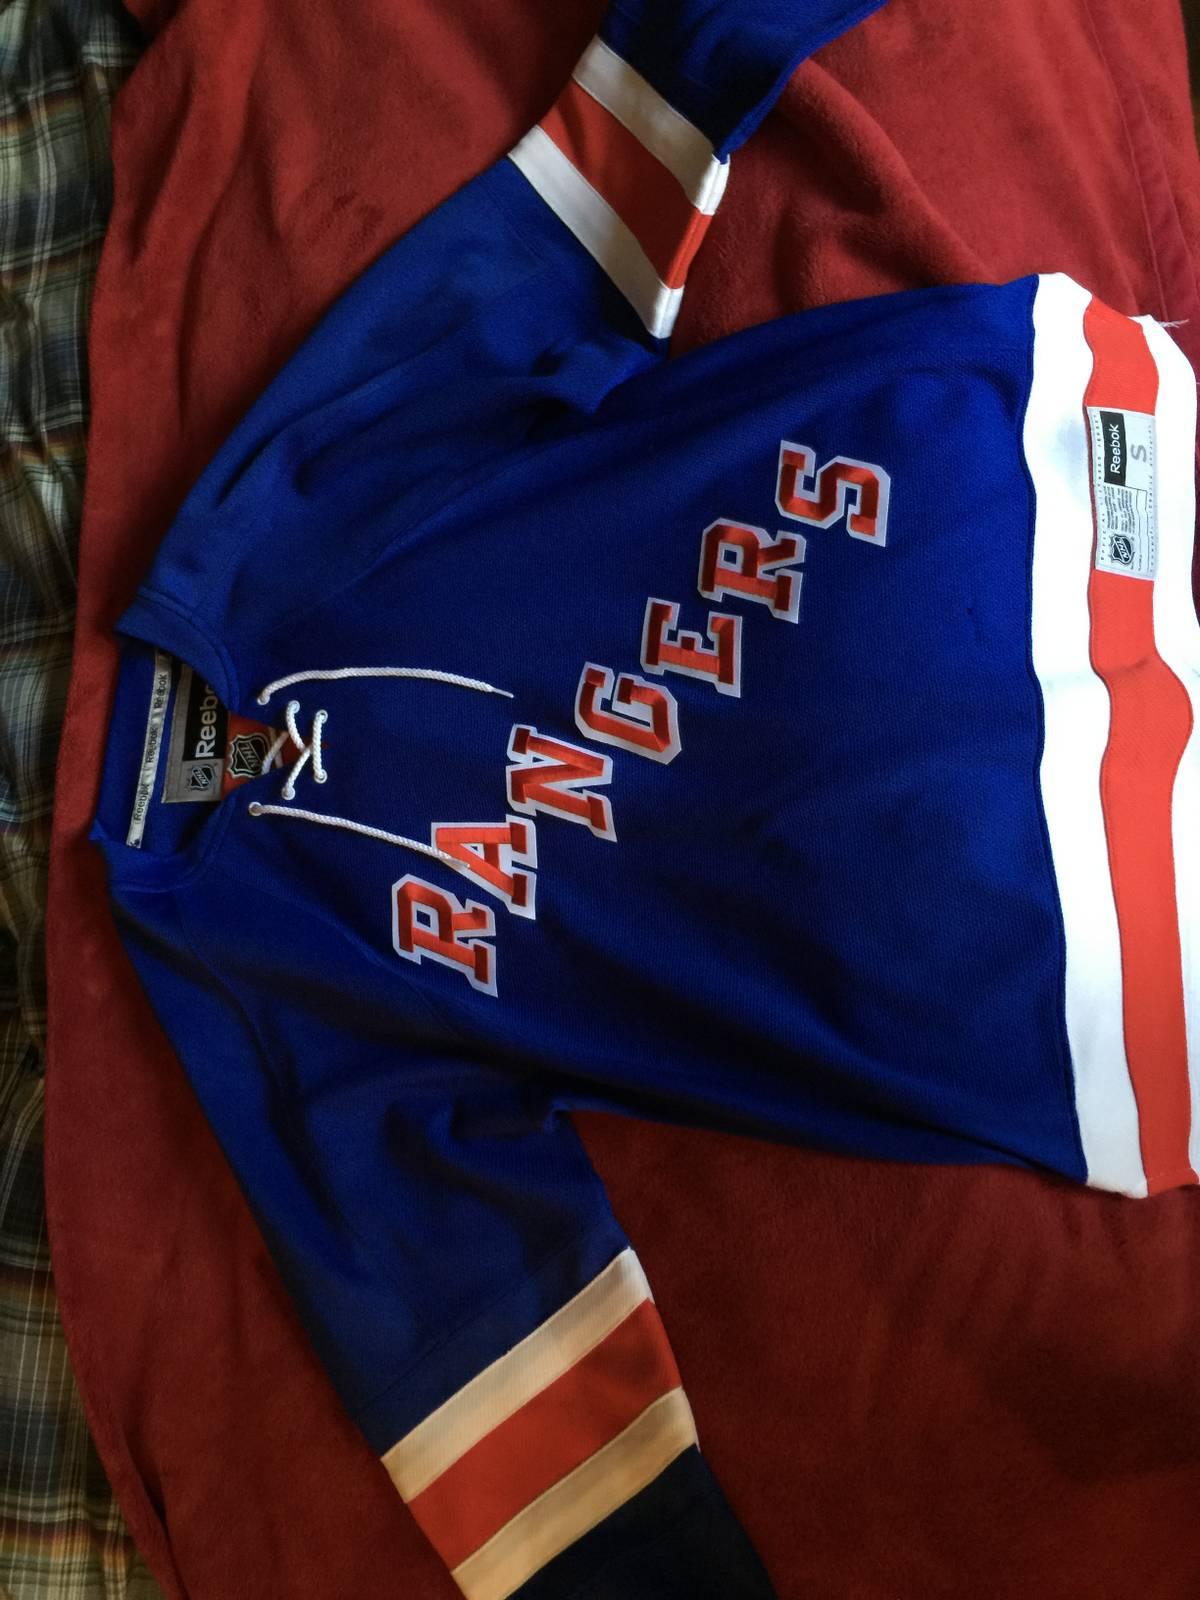 Reebok Authentic New York Rangers Jersey Size l - Jerseys for Sale - Grailed 868470de0